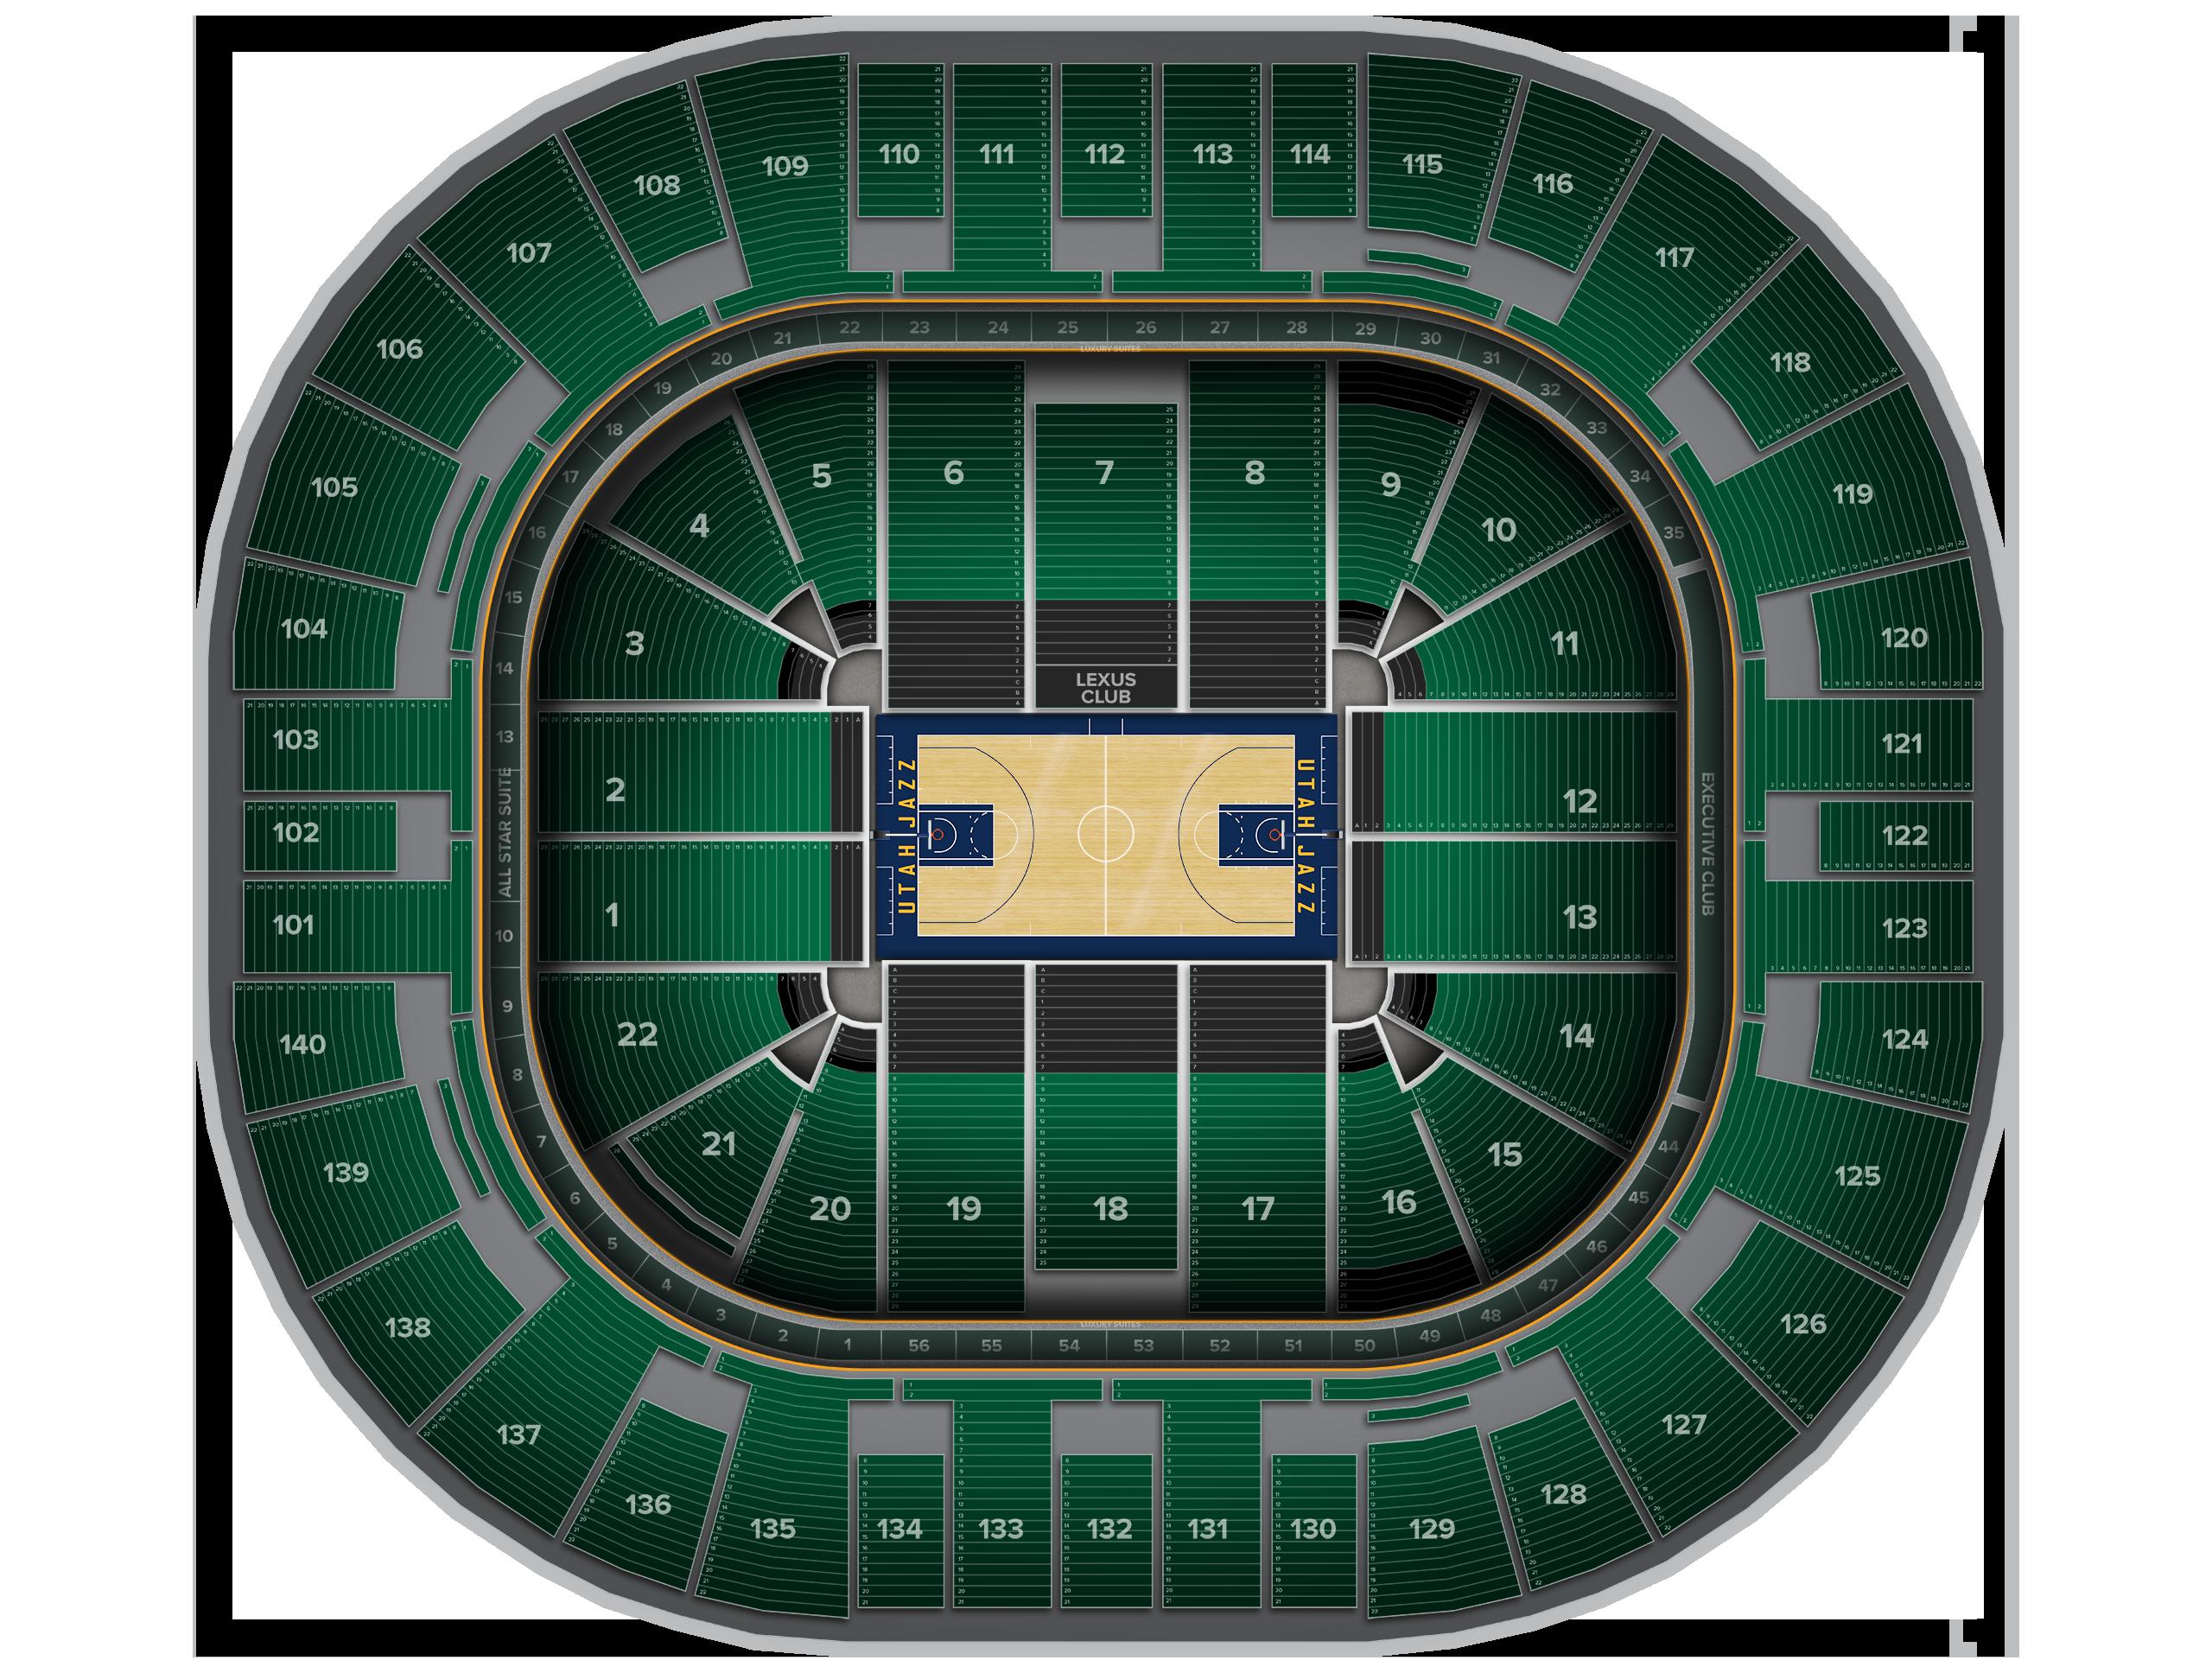 Vivint Smart Home Arena Tickets